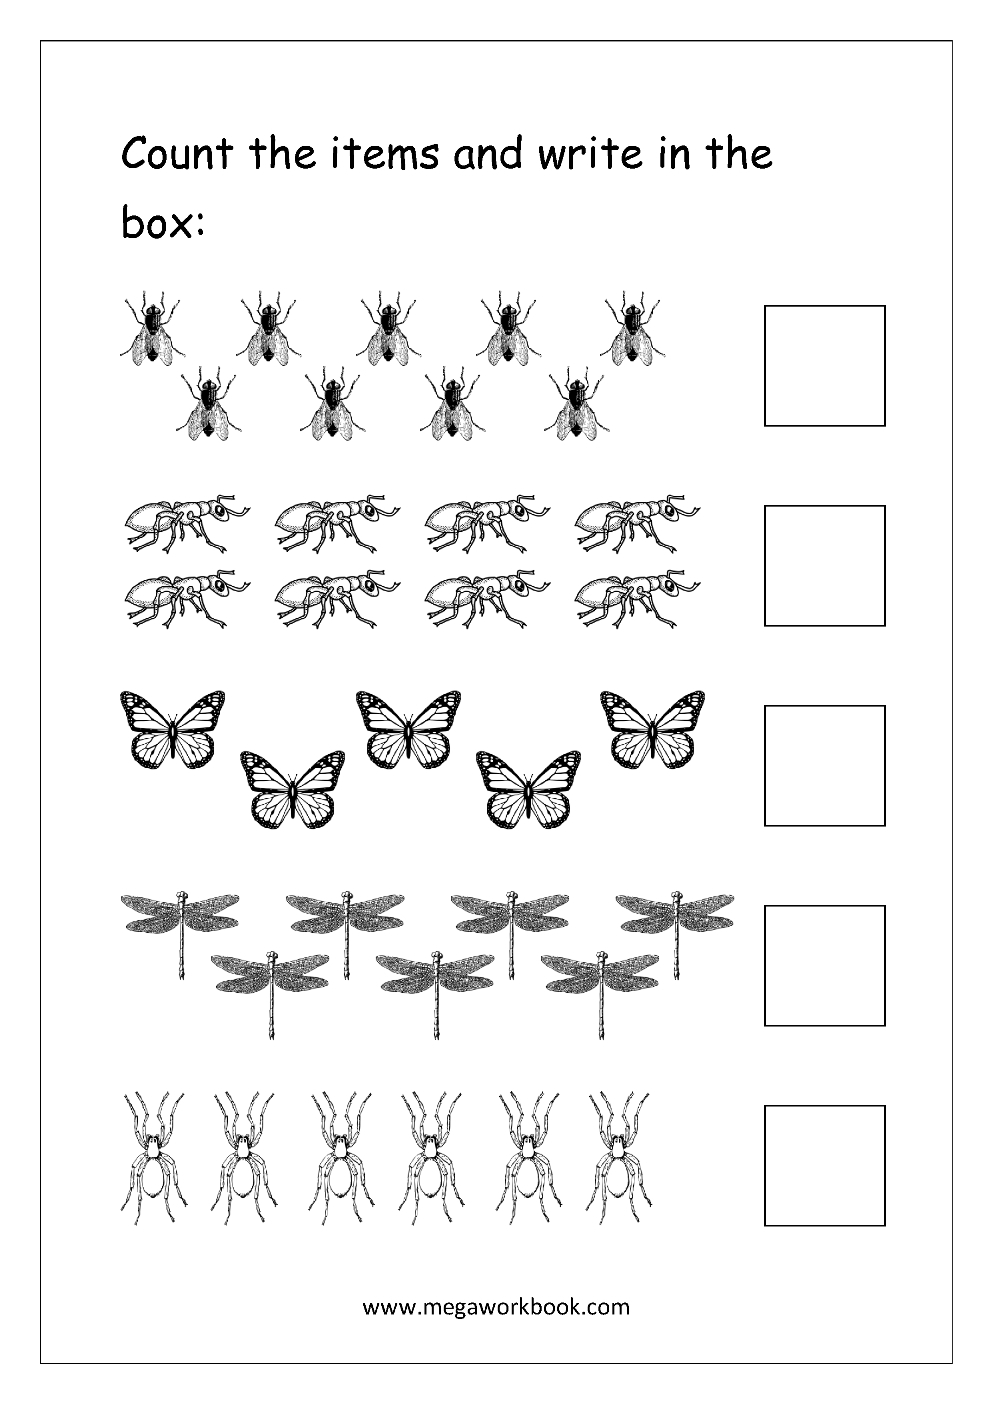 Free Printable Number Counting Worksheets - Count And Match - Count   Free Printable Counting Worksheets 1 20